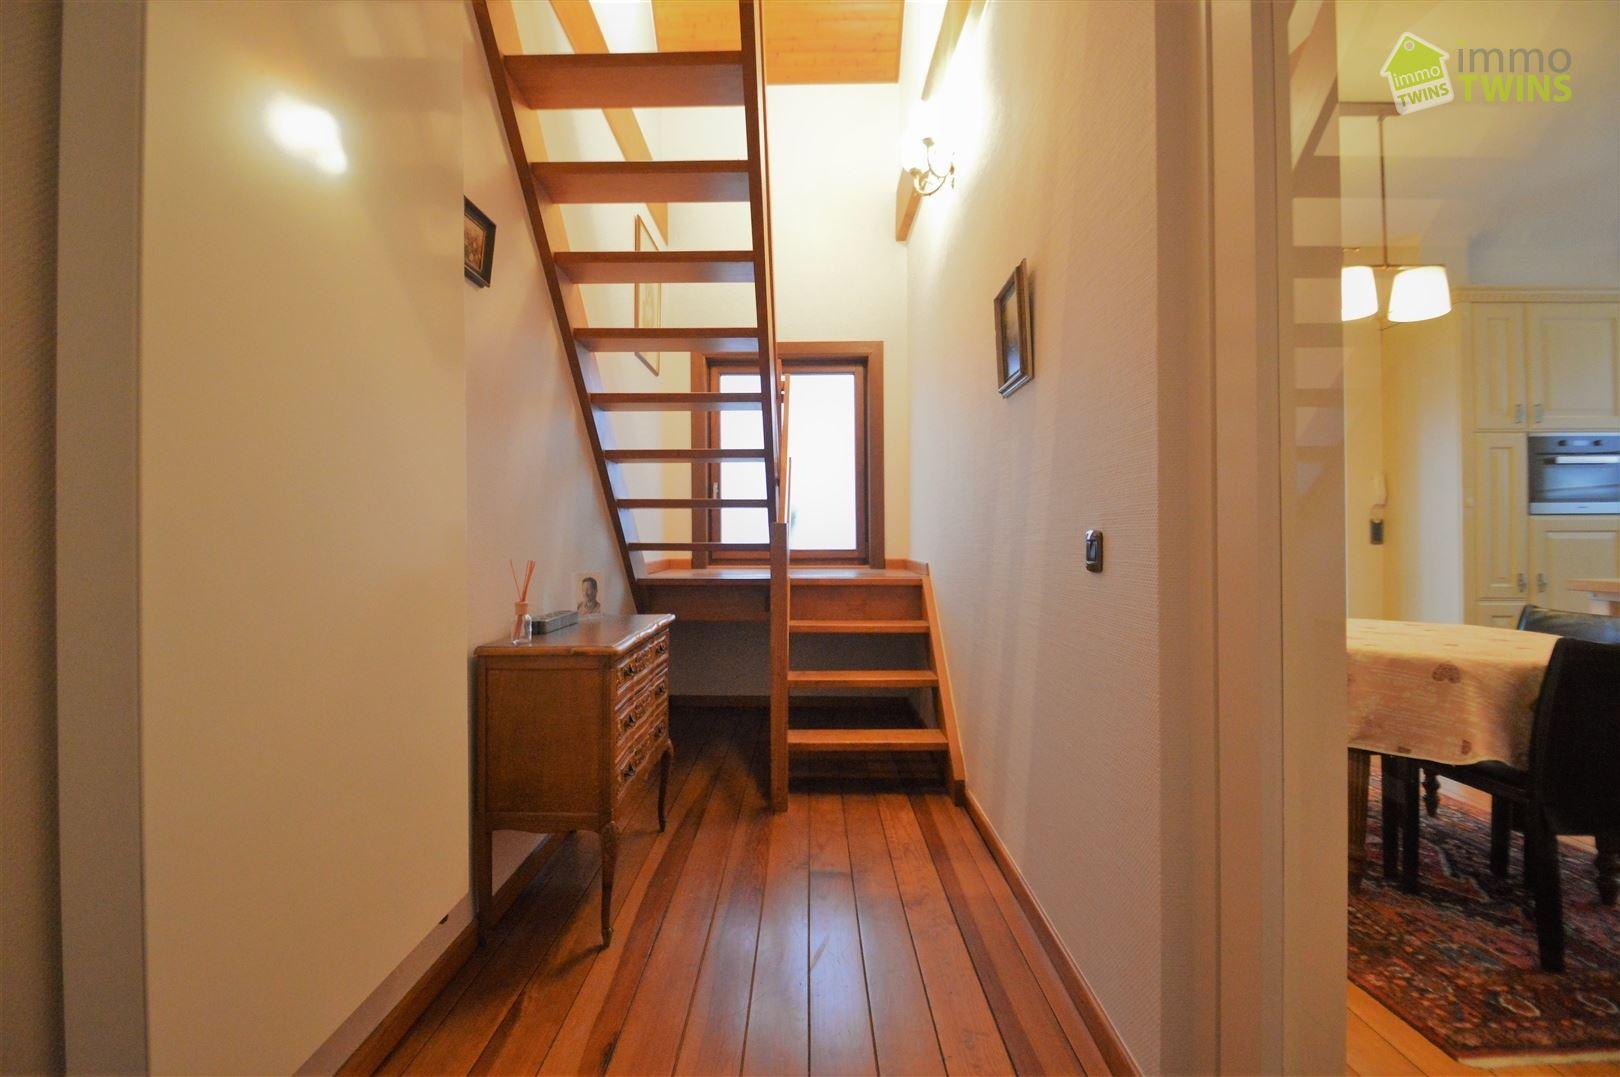 Foto 15 : Duplex/Penthouse te 2890 SINT-AMANDS (België) - Prijs € 429.000